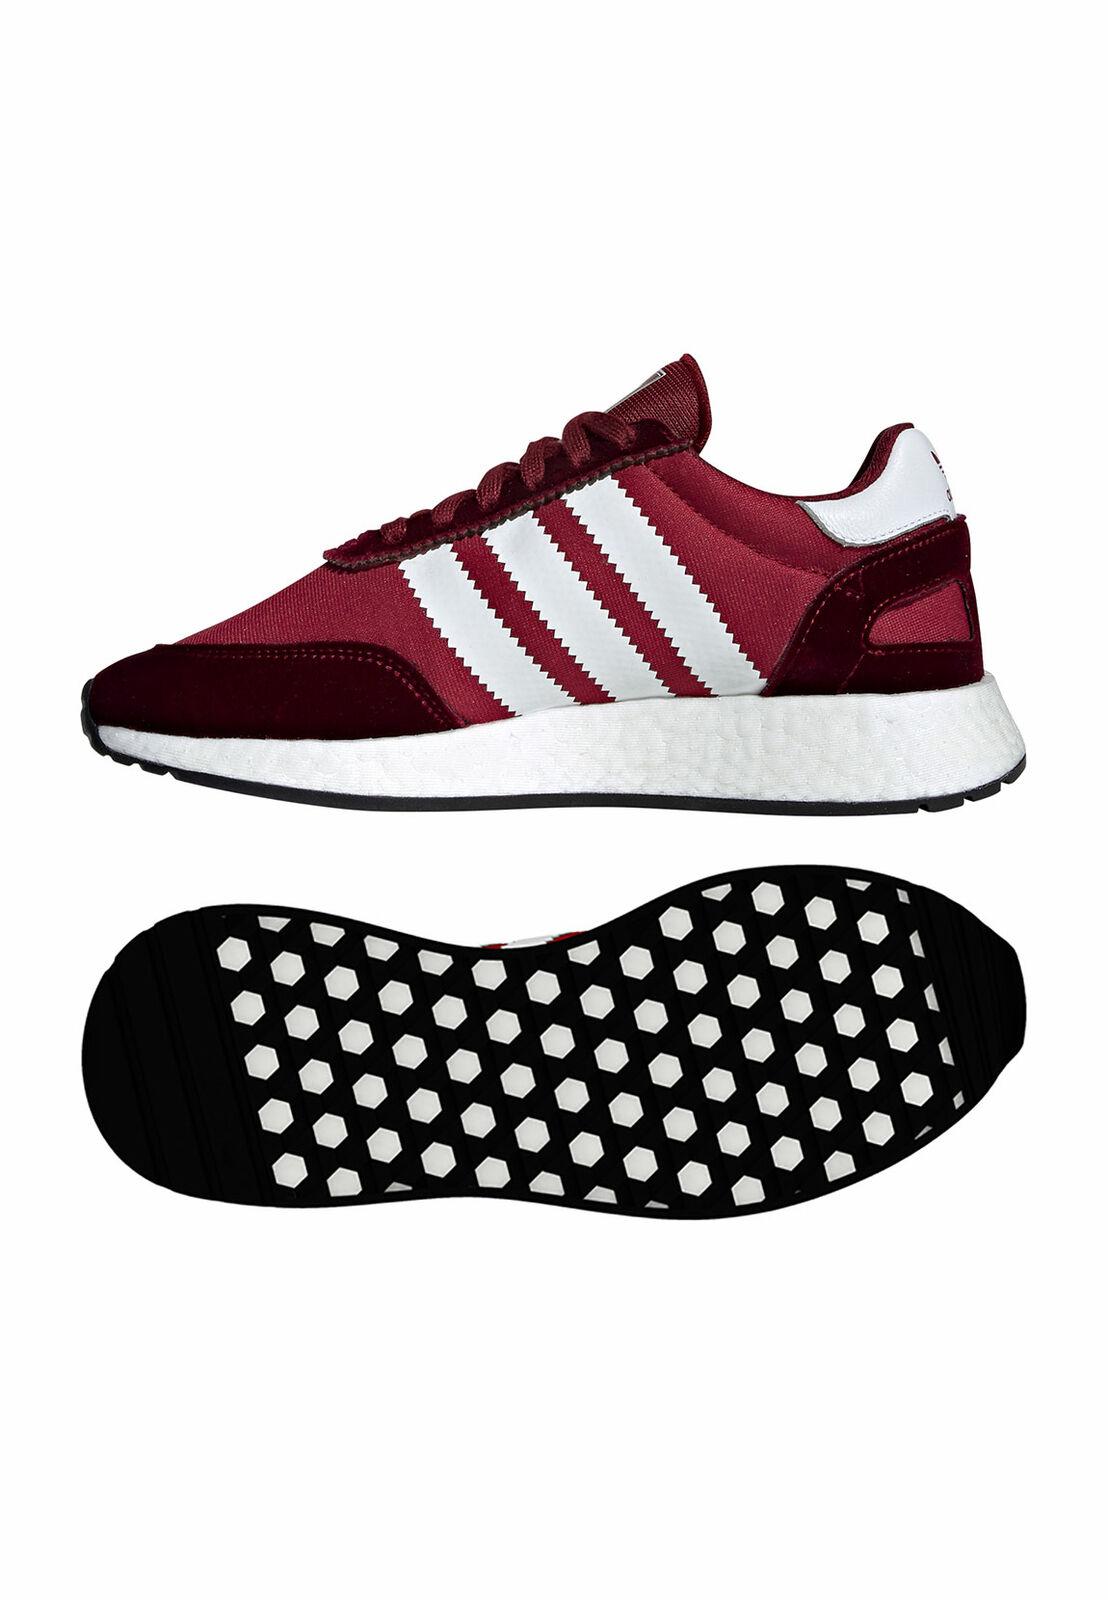 Adidas Originals Turnschuhe I-5923W EE4959 Weinrot